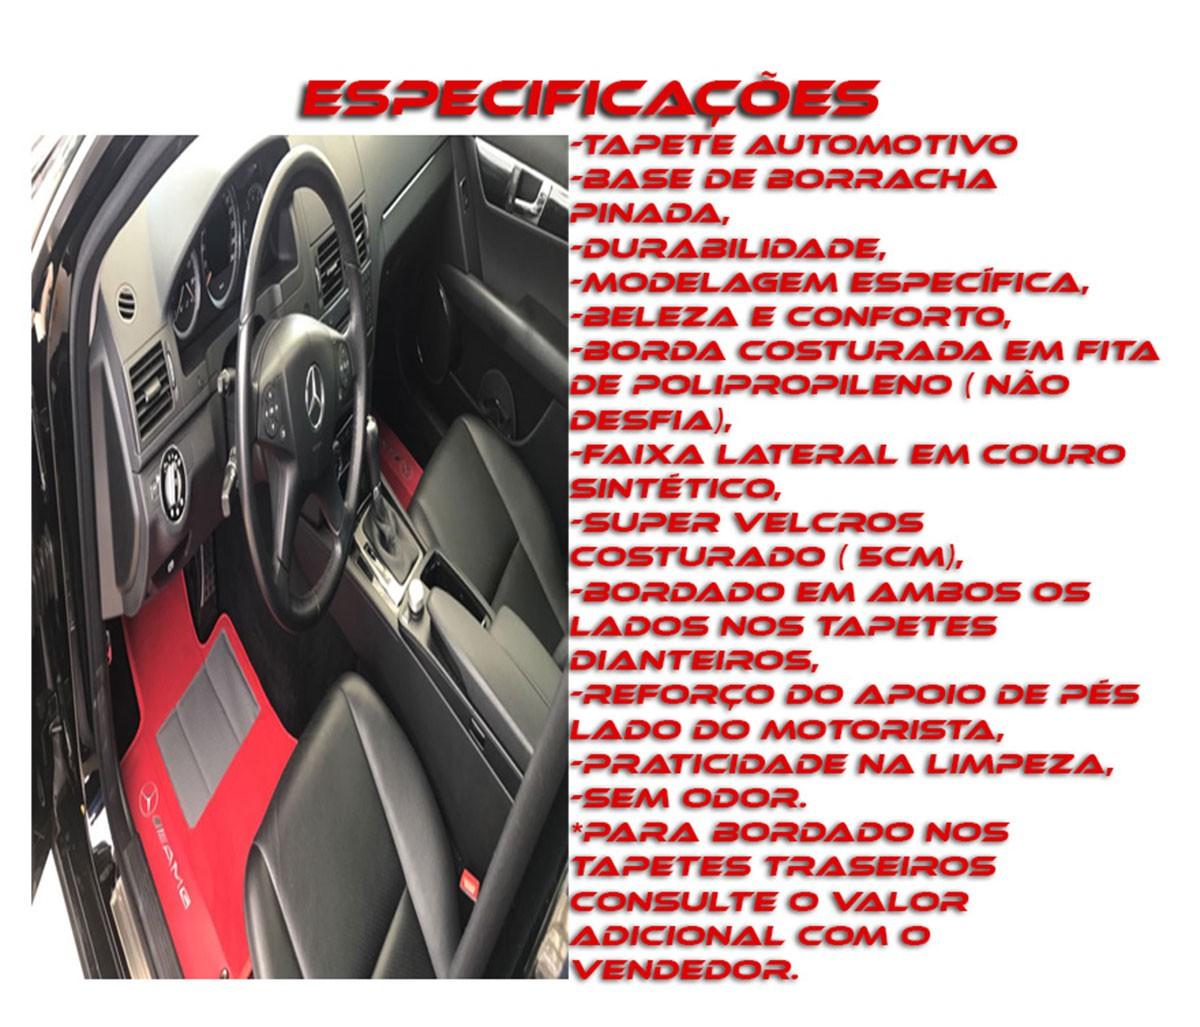 Tapete Fiat Stilo Luxo Base Pinada